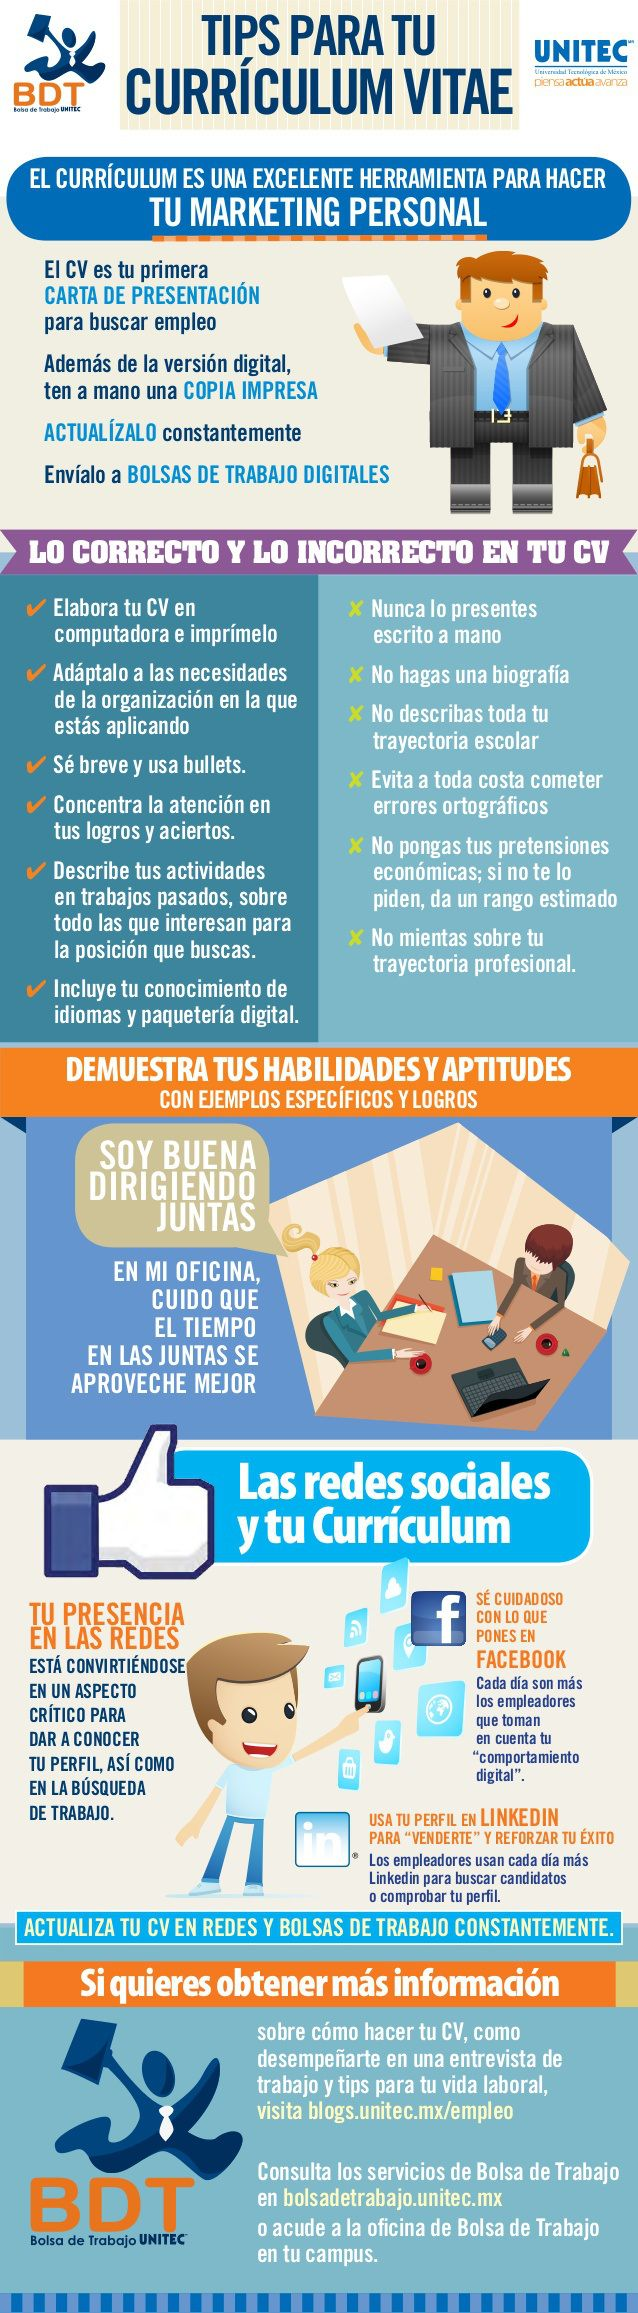 Consejos para tu Curriculum y tu marketing personal #infografia ...